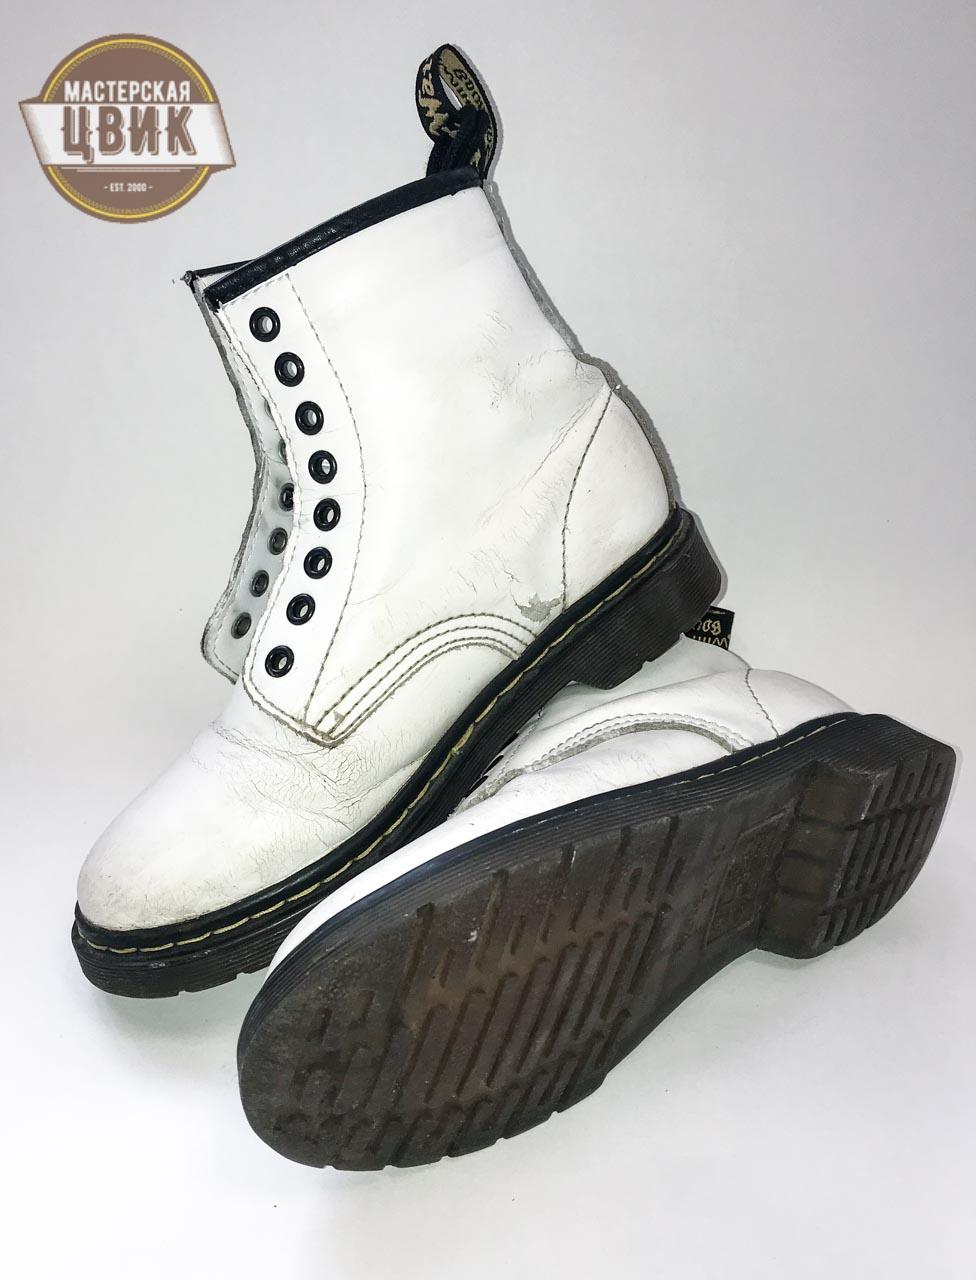 individualnyj-poshiv-obuvi-minsk-28 Индивидуальный пошив обуви